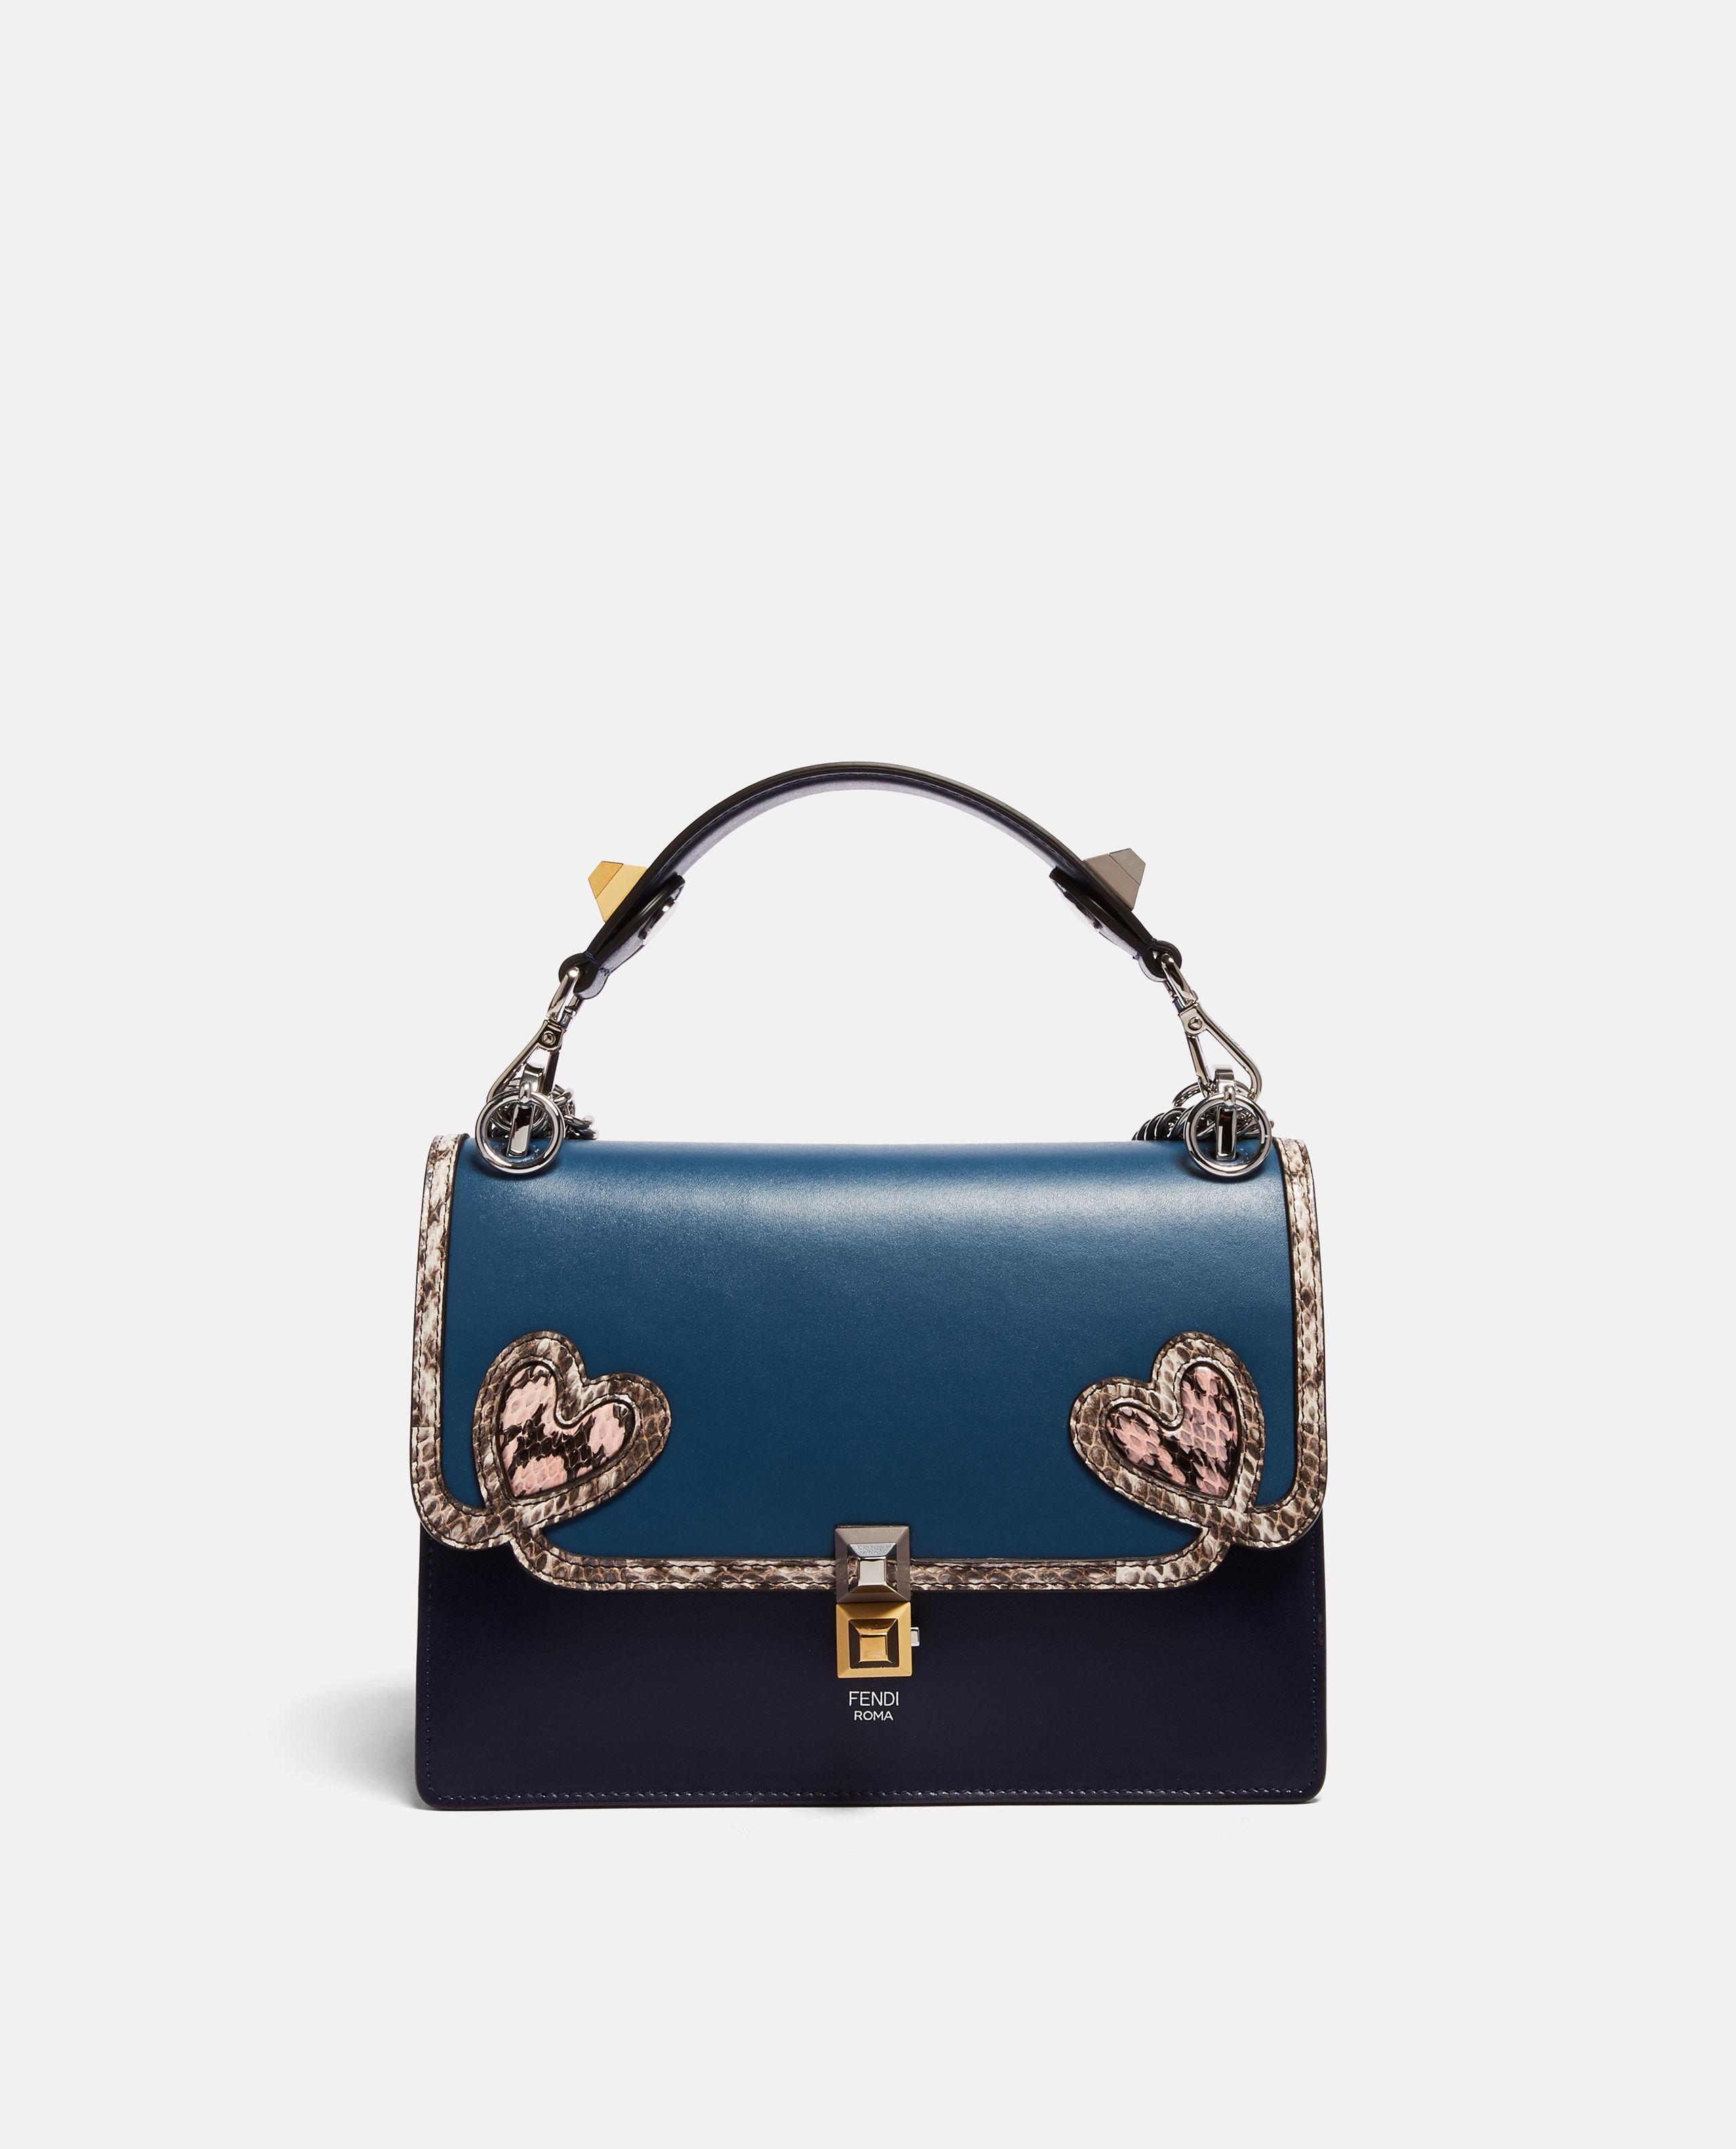 79a21a4c8656 Lyst - Fendi Kan I Bag in Blue